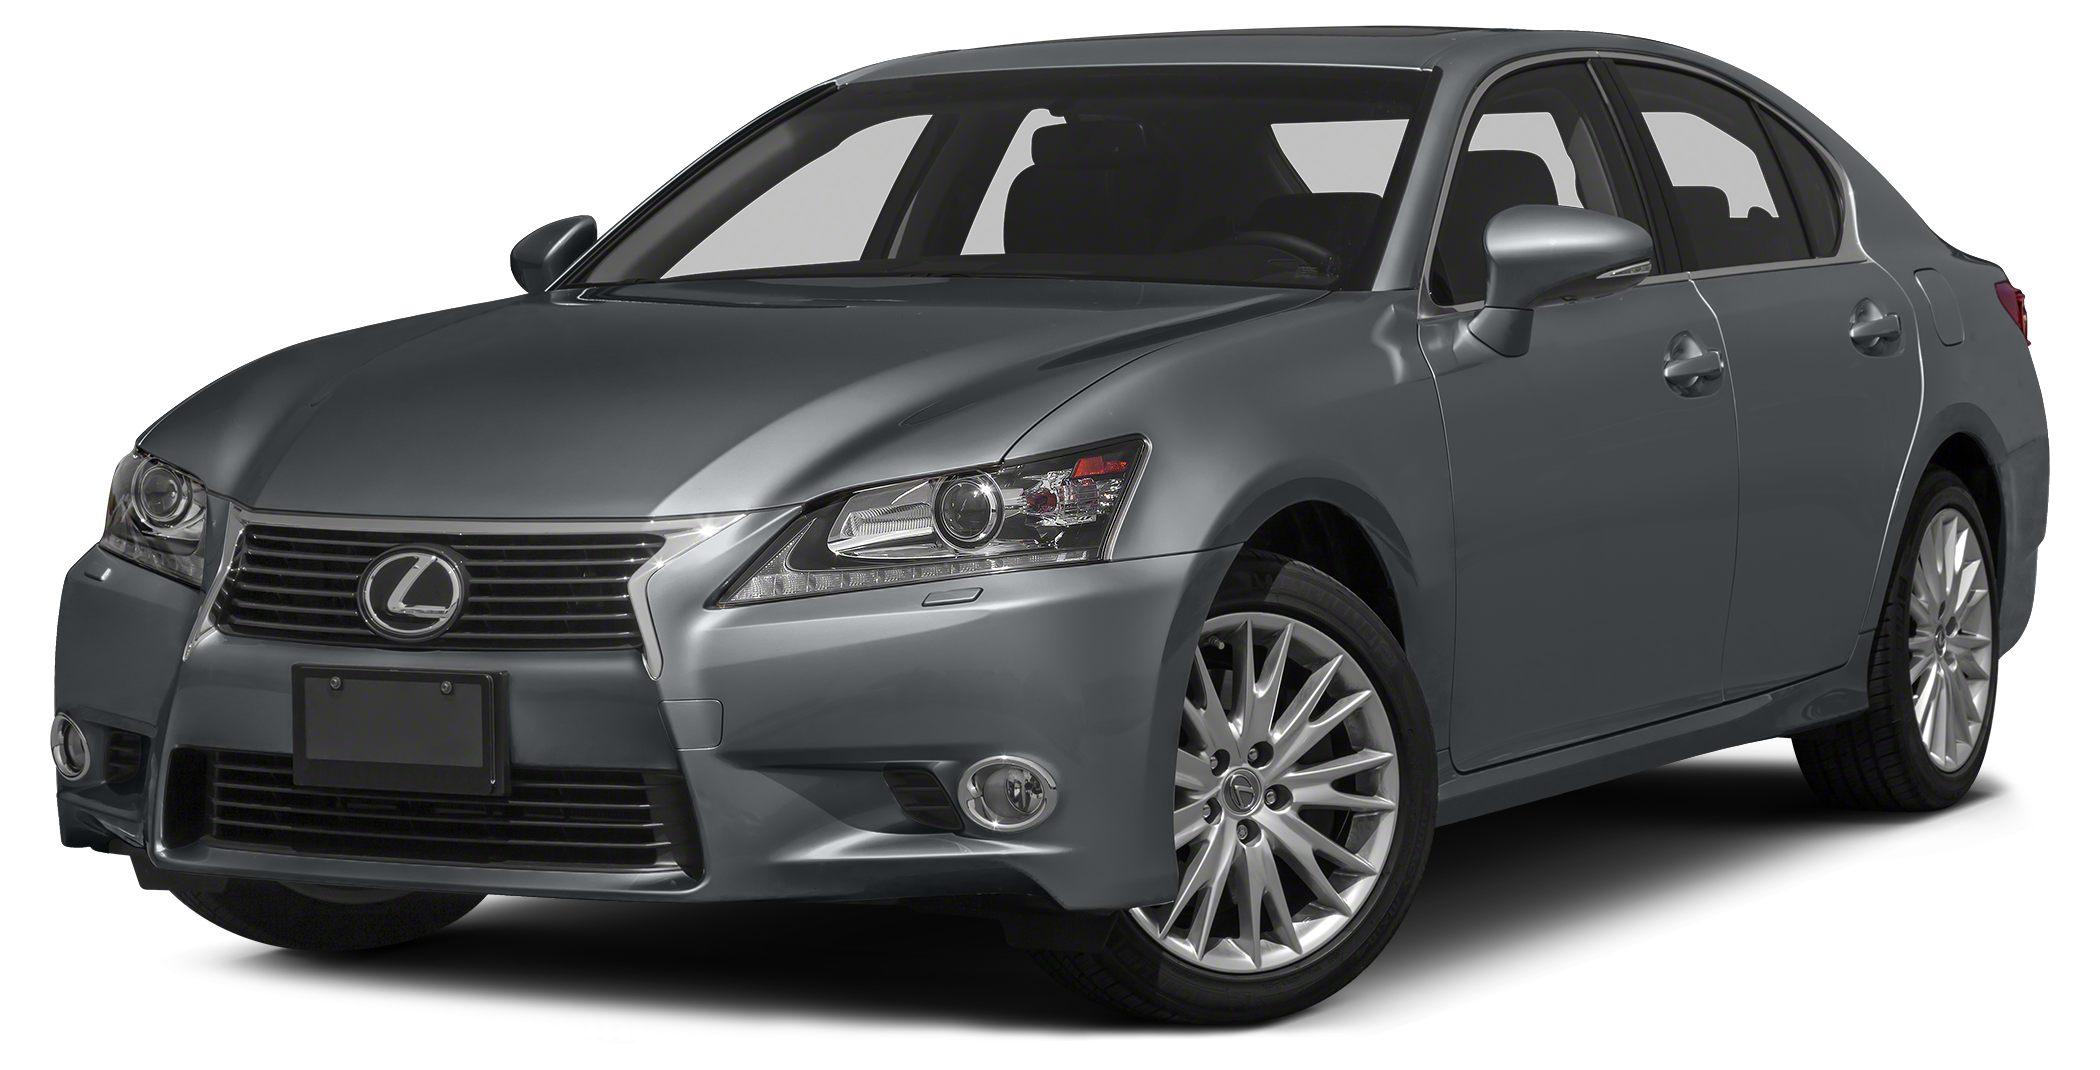 2015 Lexus GS 350 Base This 2015 Lexus GS 350 4dr 4dr Sedan RWD features a 35L V6 CYLINDER 6cyl G